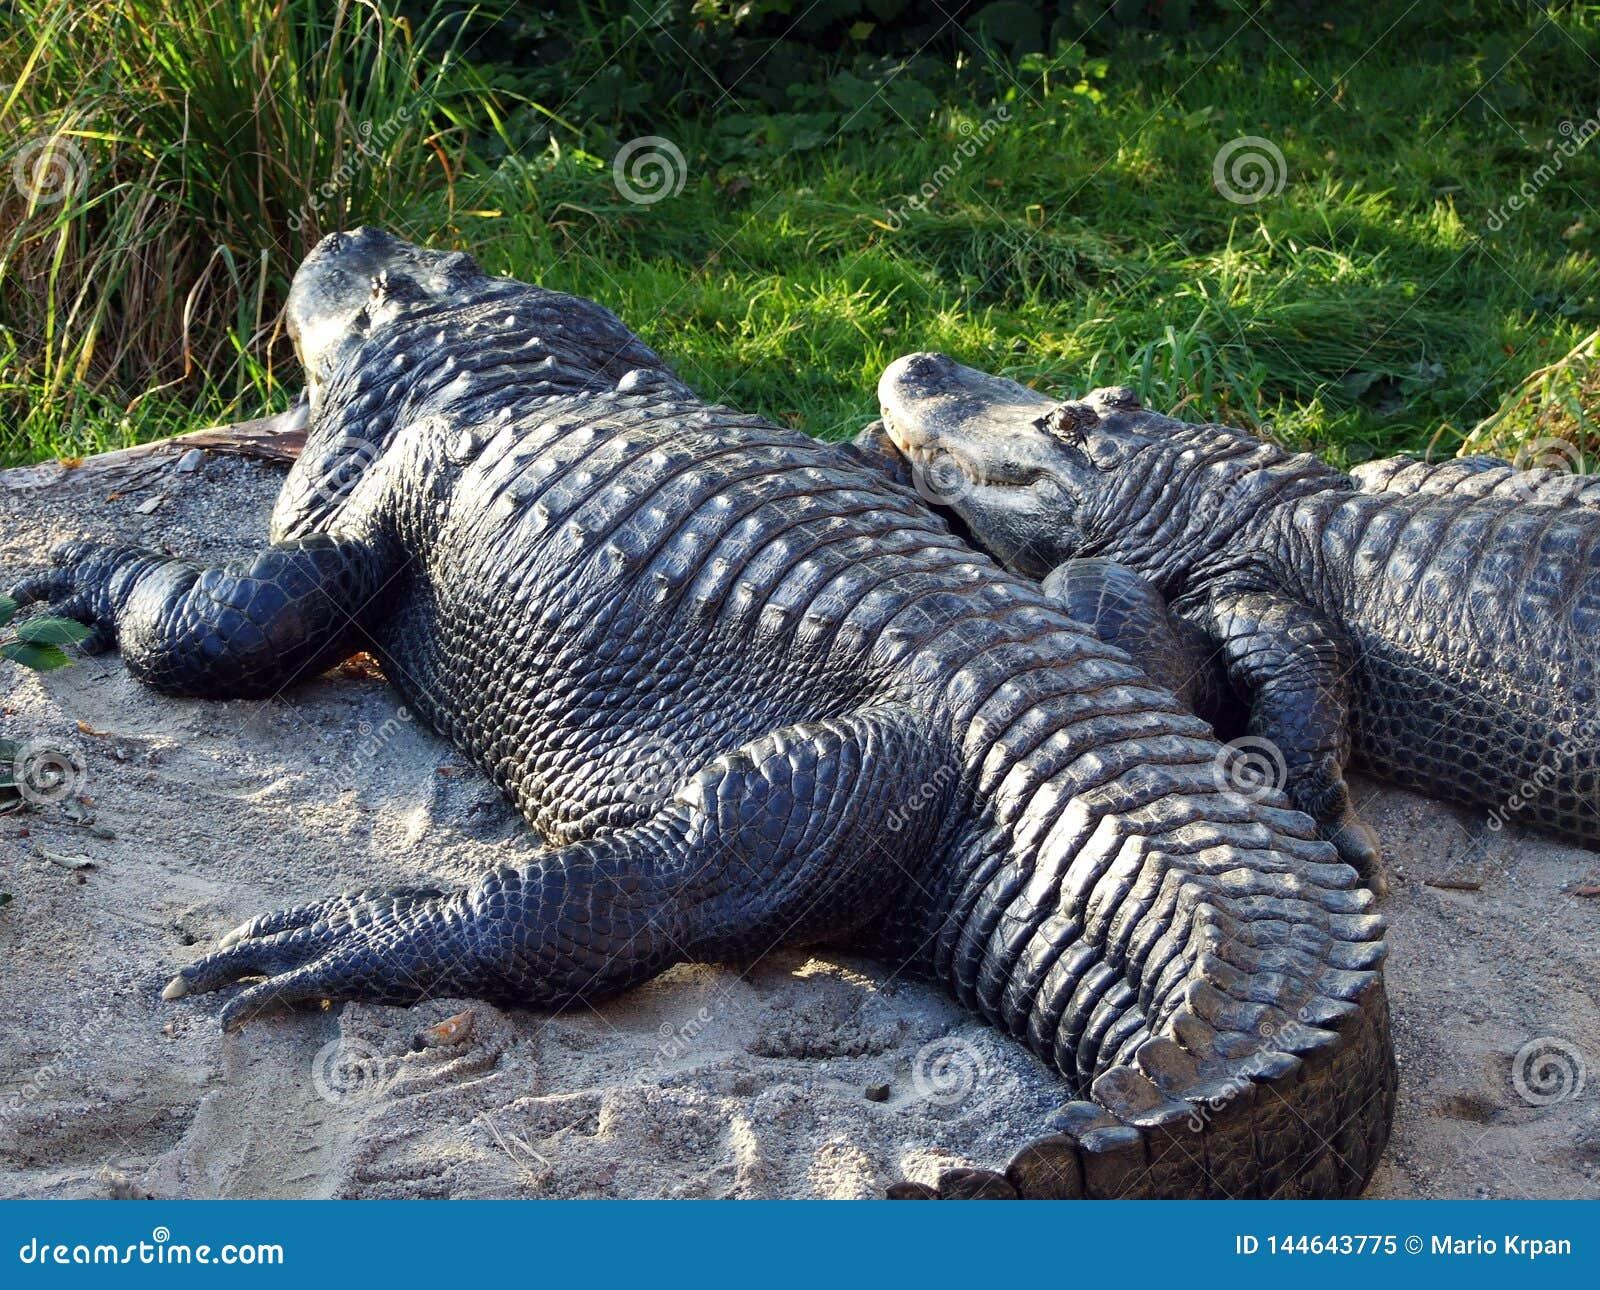 The American alligator Alligator mississippiensis, gator, common alligator, Der Mississippi-Alligator or Hechtalligator